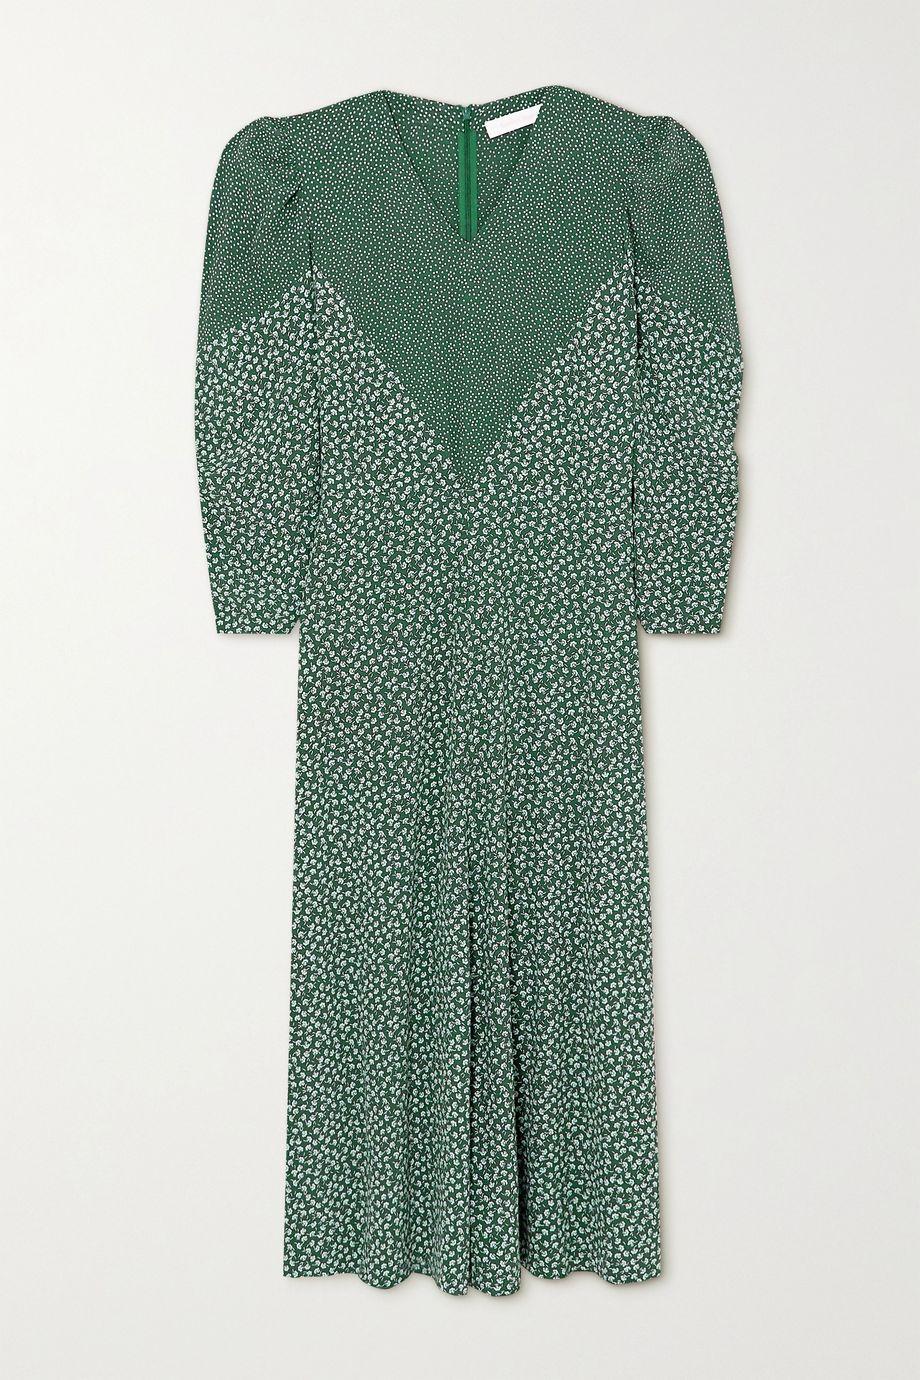 See By Chloé Paneled printed crepe maxi dress